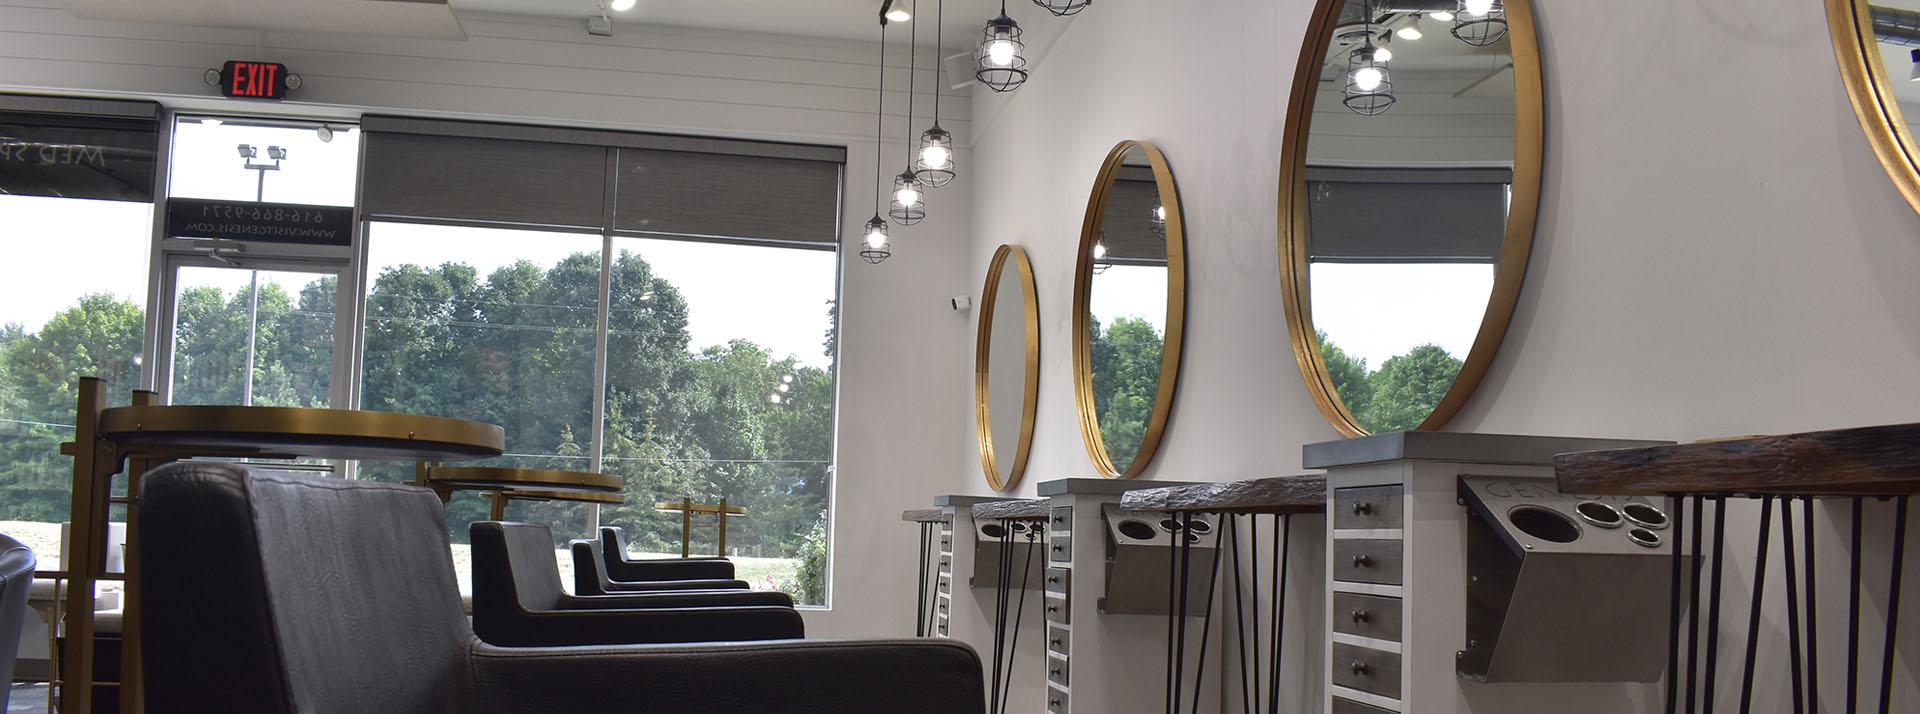 Genesis hair salon and spa